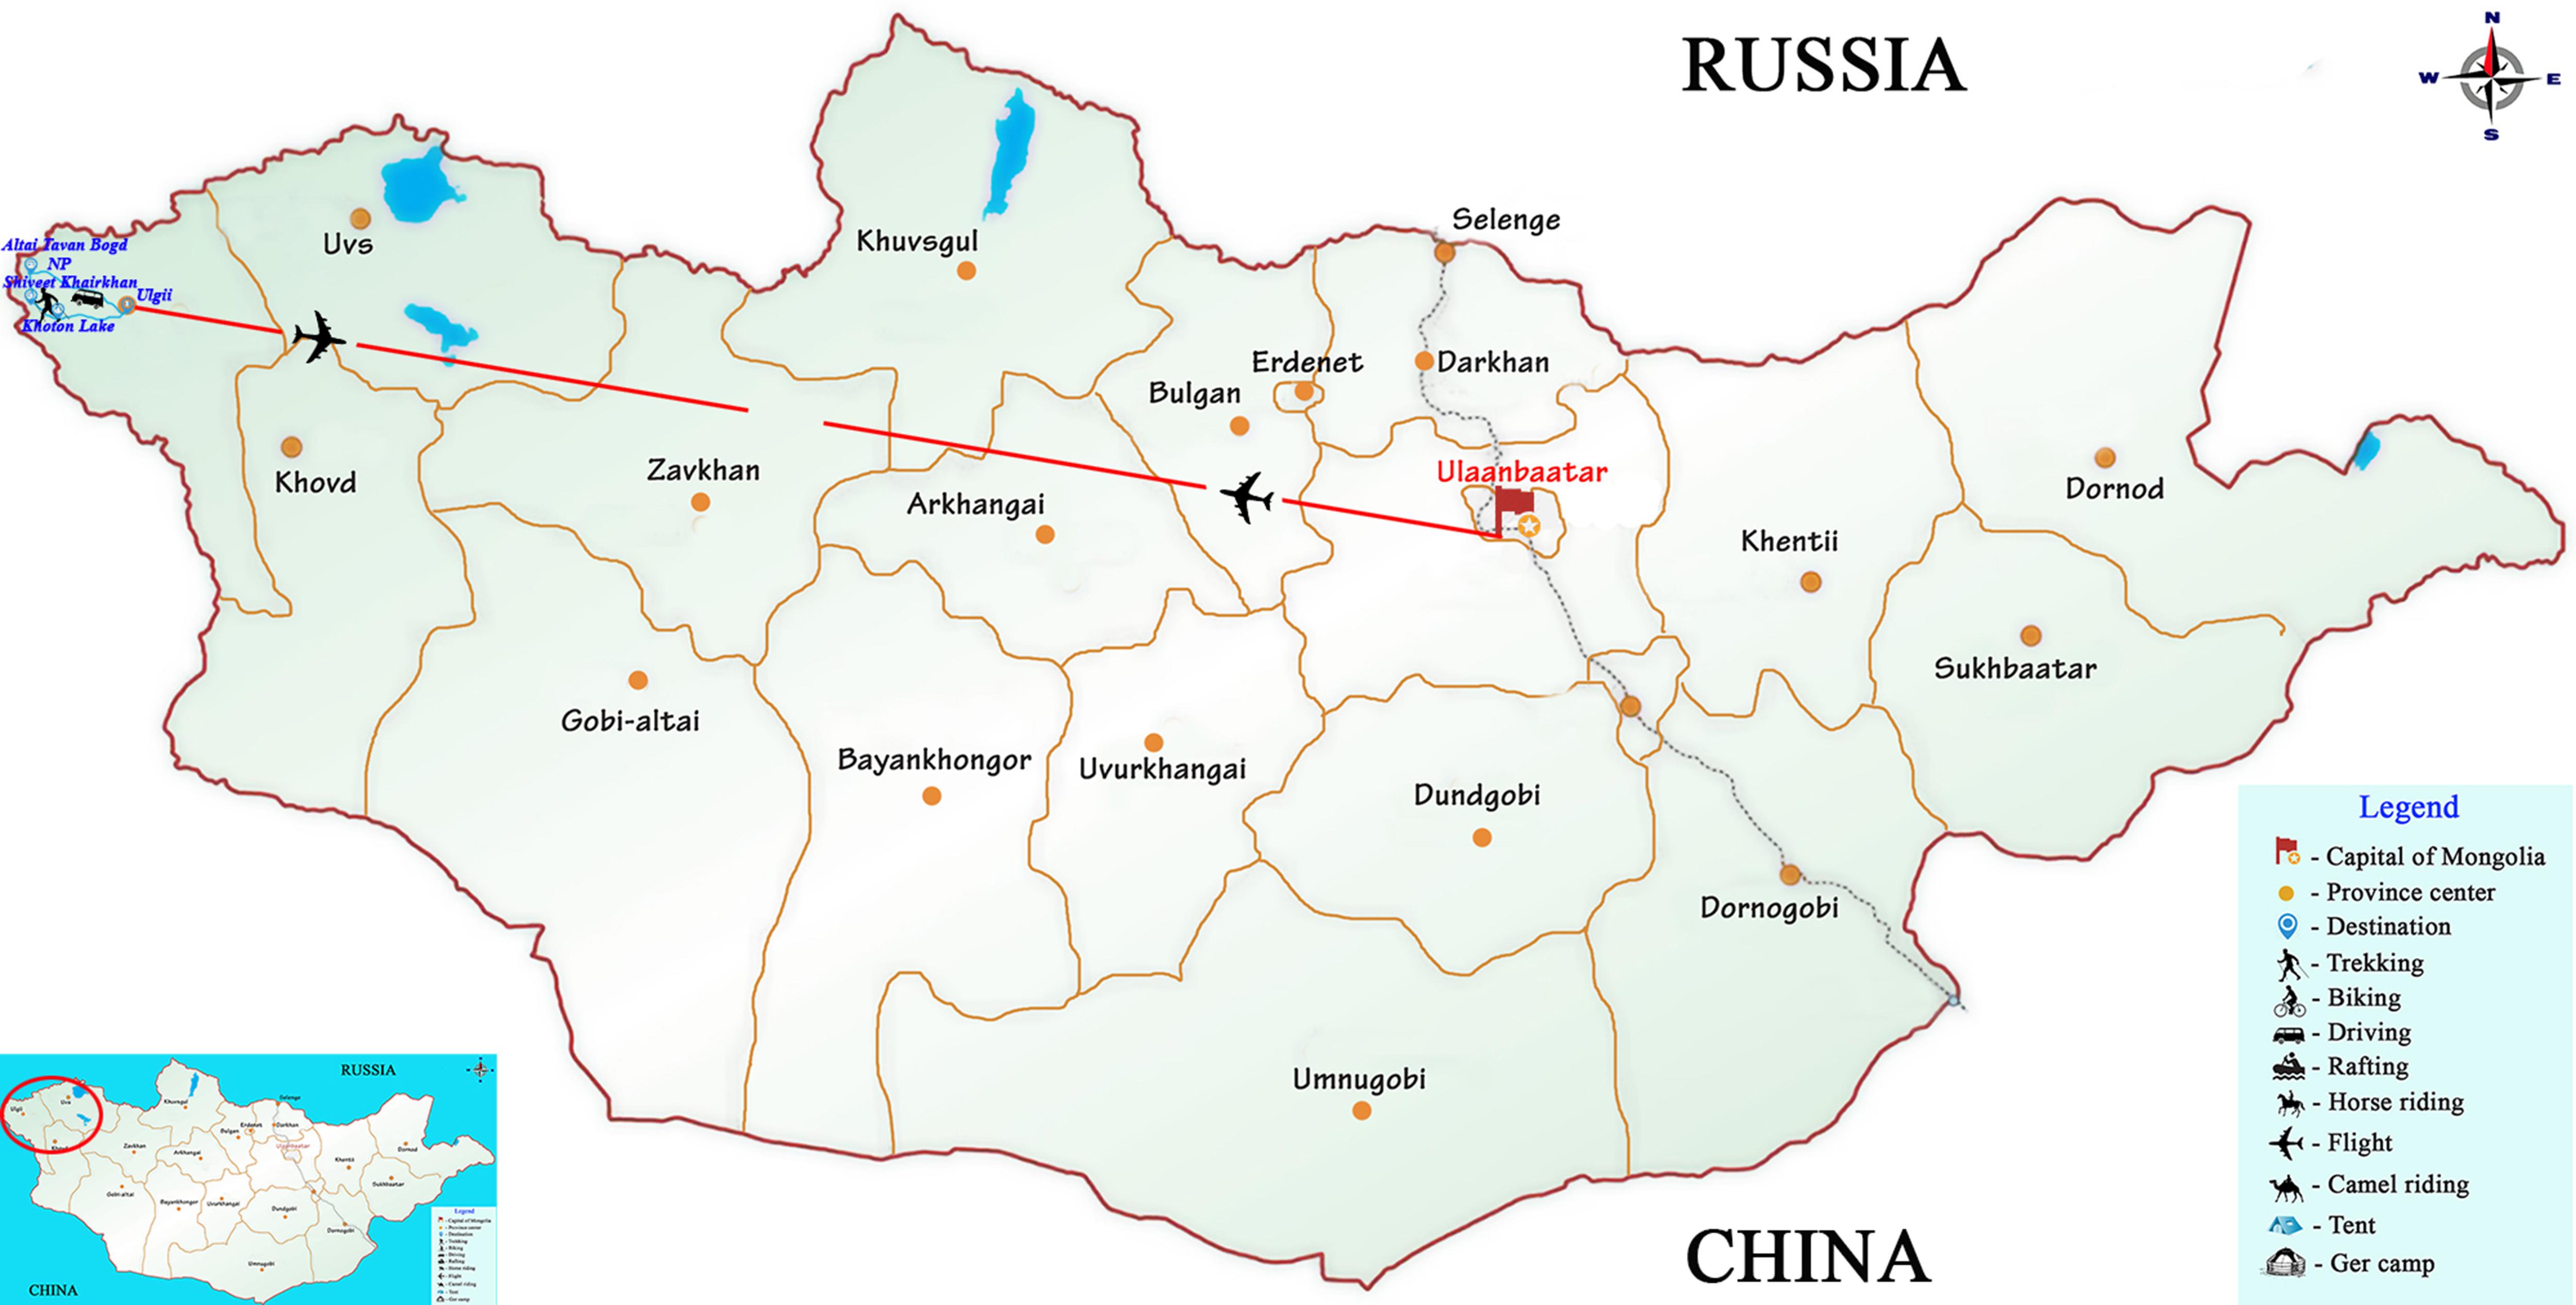 Mongolia, Holy Altai Inspiring Trail